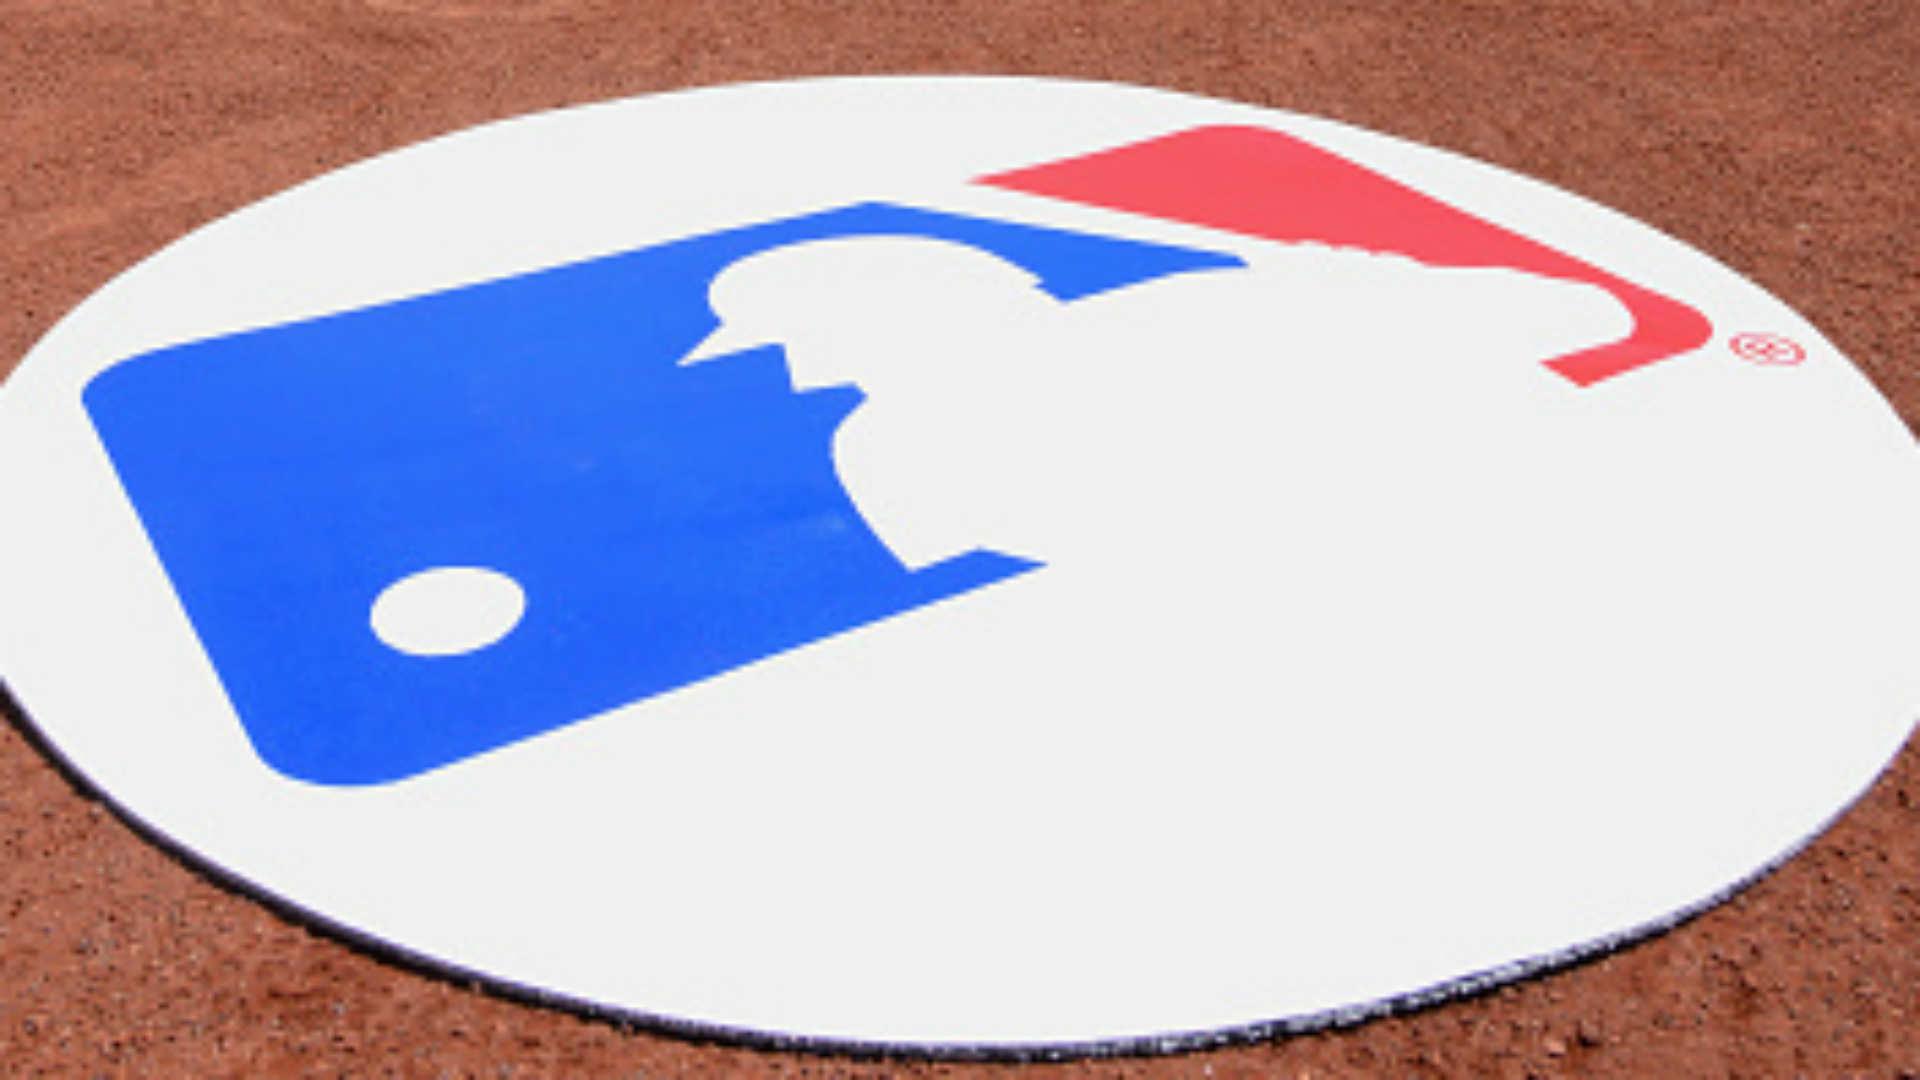 LOOK: All 30 MLB teams to wear Marjory Stoneman Douglas HS caps this